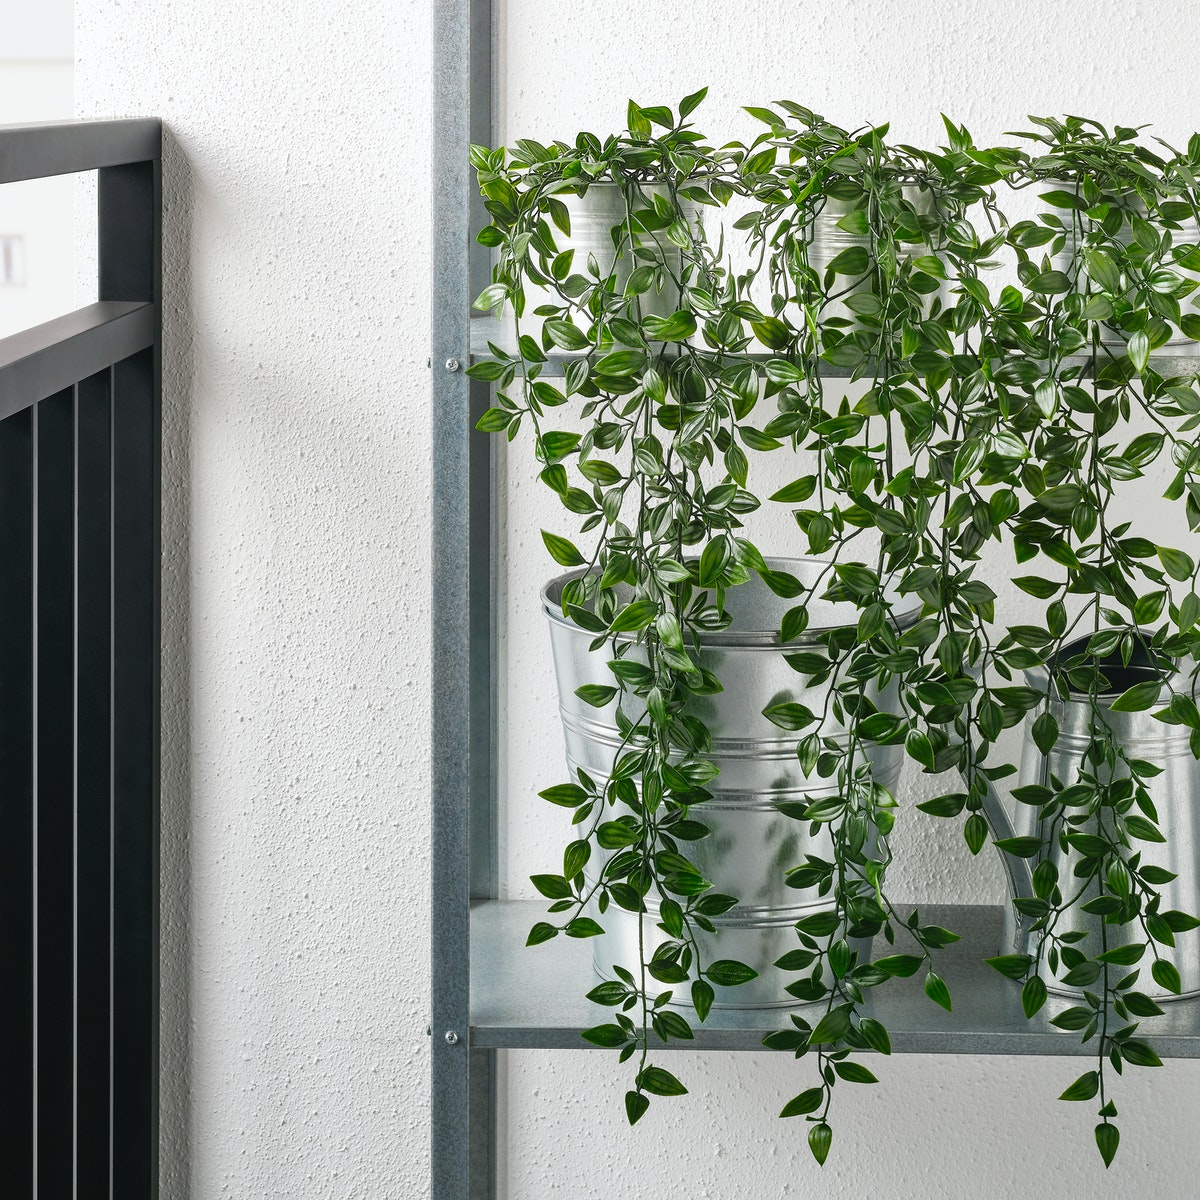 Warnai sudut ruang hobi favoritmu dengan tanaman gantung